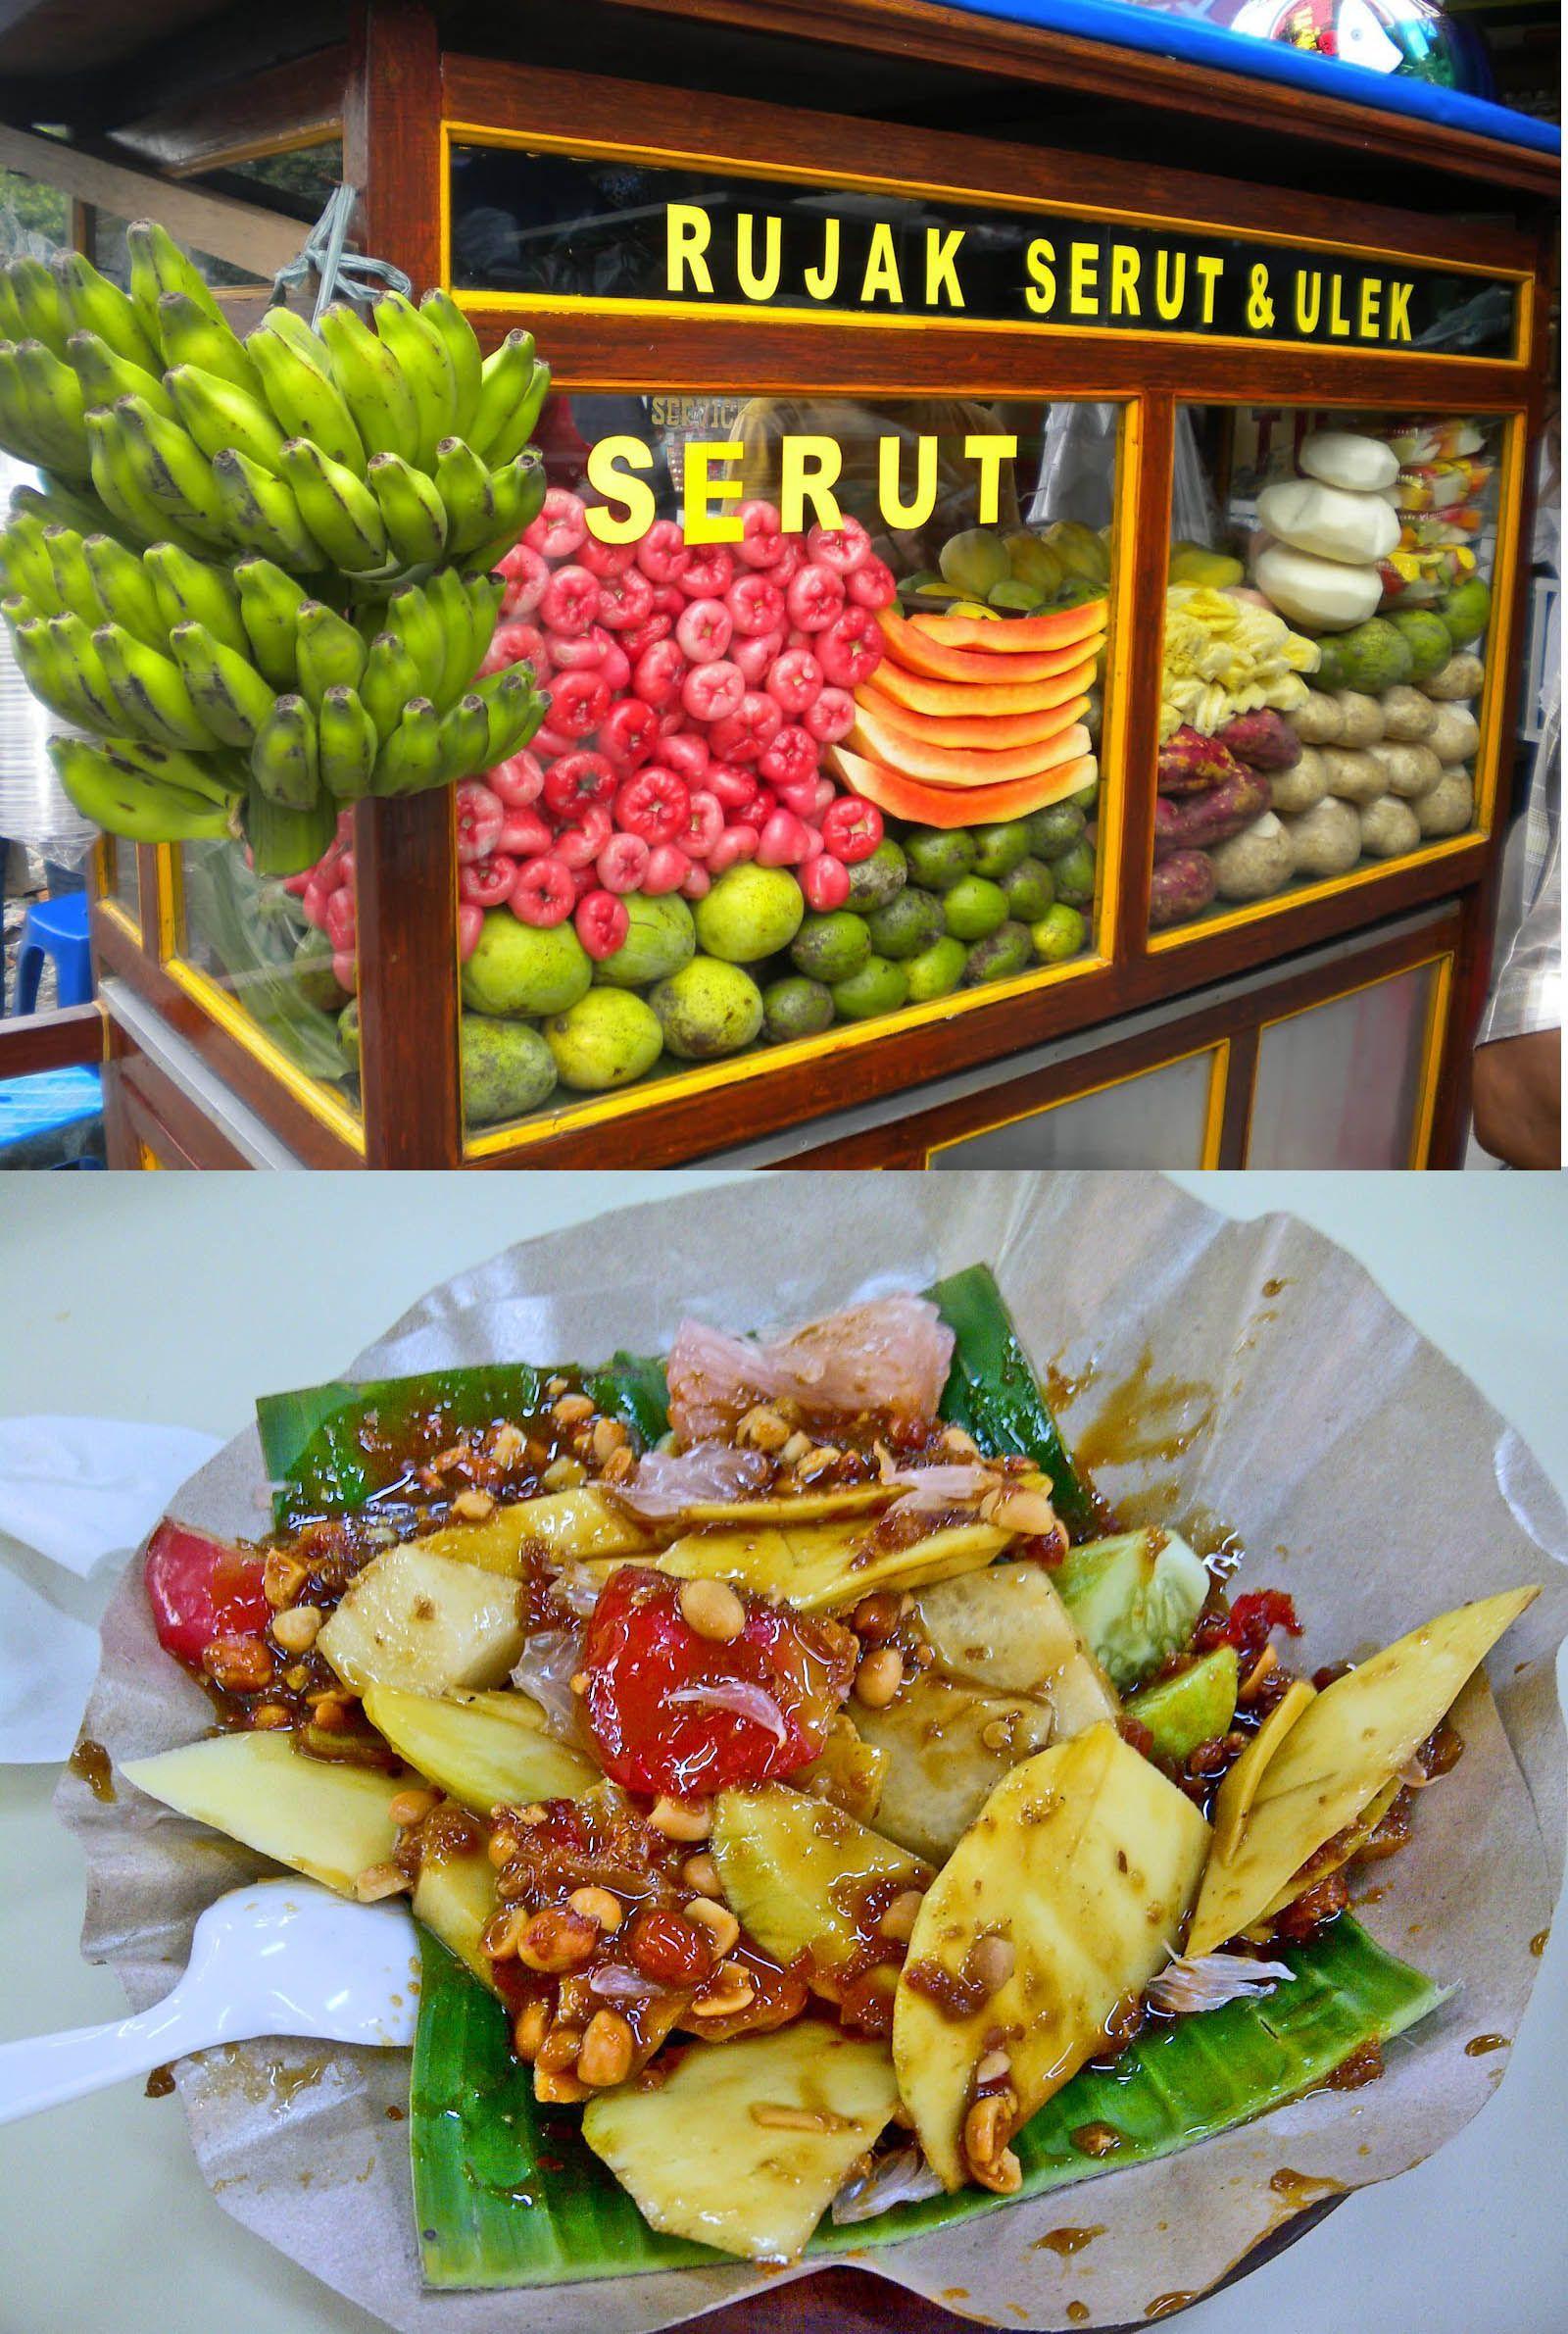 Rujak Ulek Buah Indonesianrecipe Resep Indonesiansstreetfood Masakan Asia Buah Segar Makanan Enak